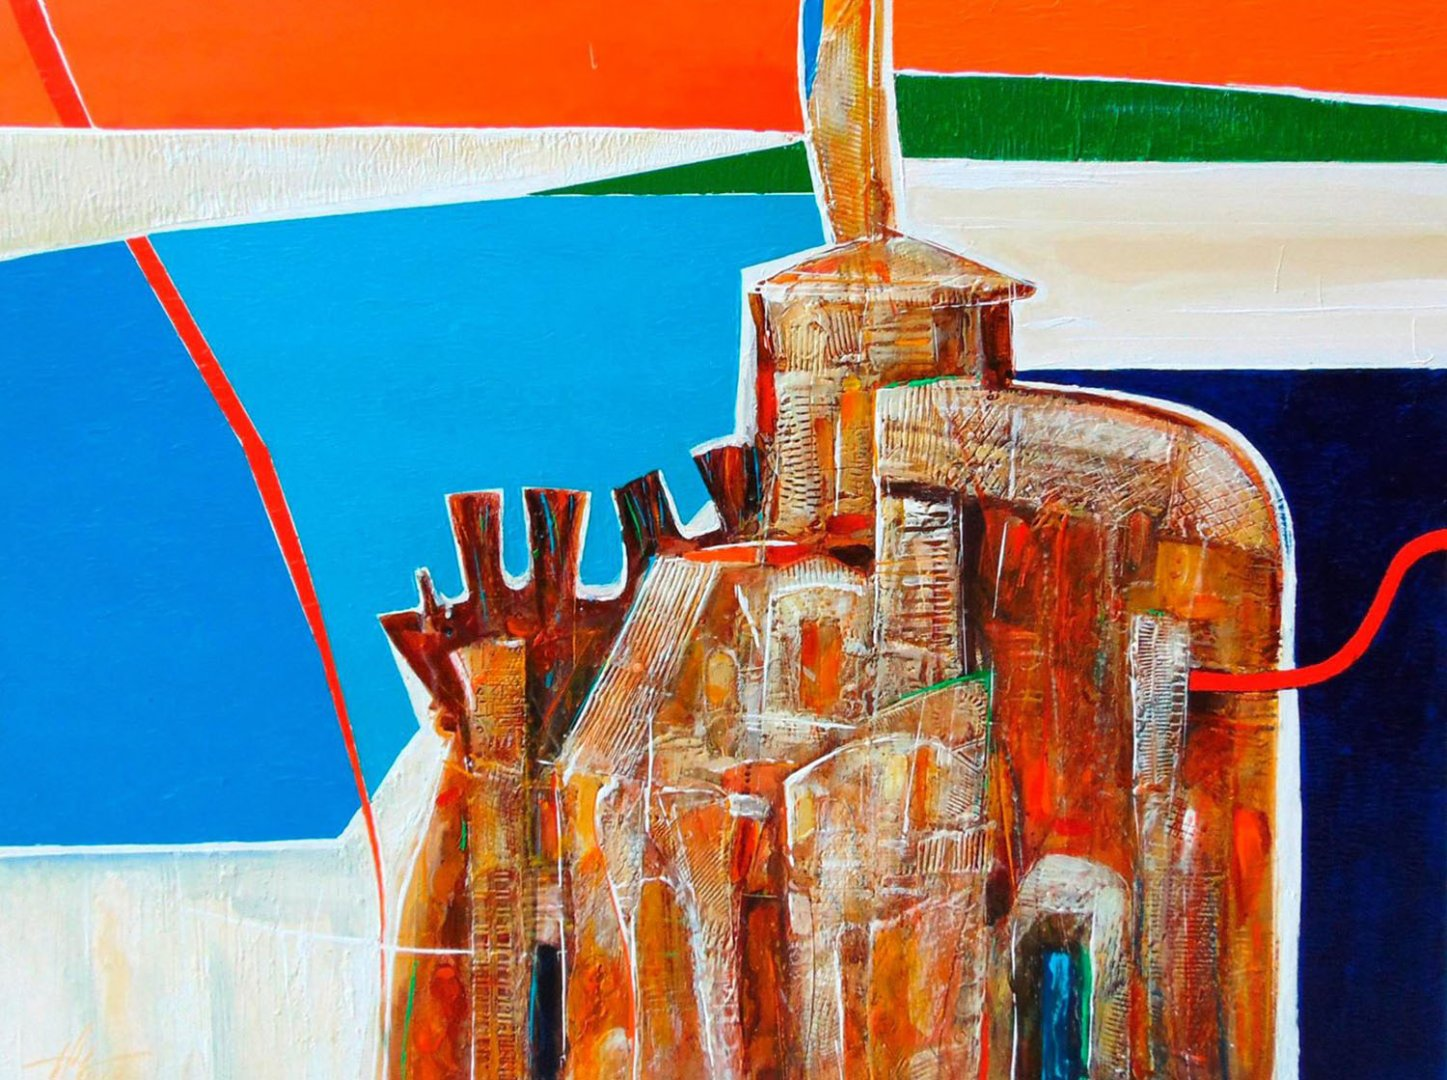 Художникът Тодор Тодоров гостува в галерия Бургас с 19 платна